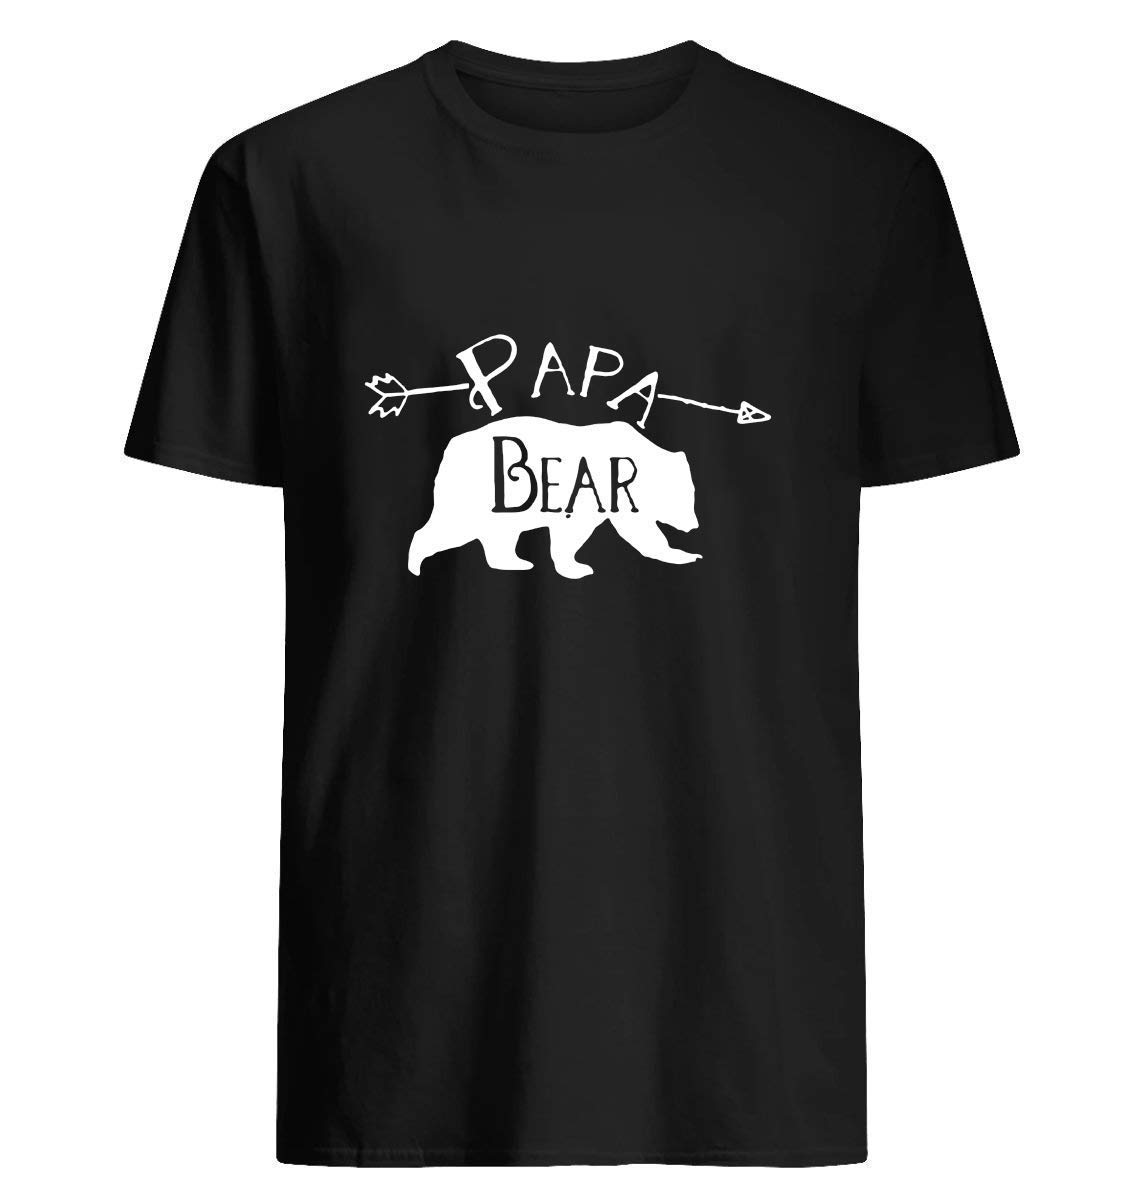 Papa Bear T-shirt, Papa T-shirt, Bear T-shirt 75 1